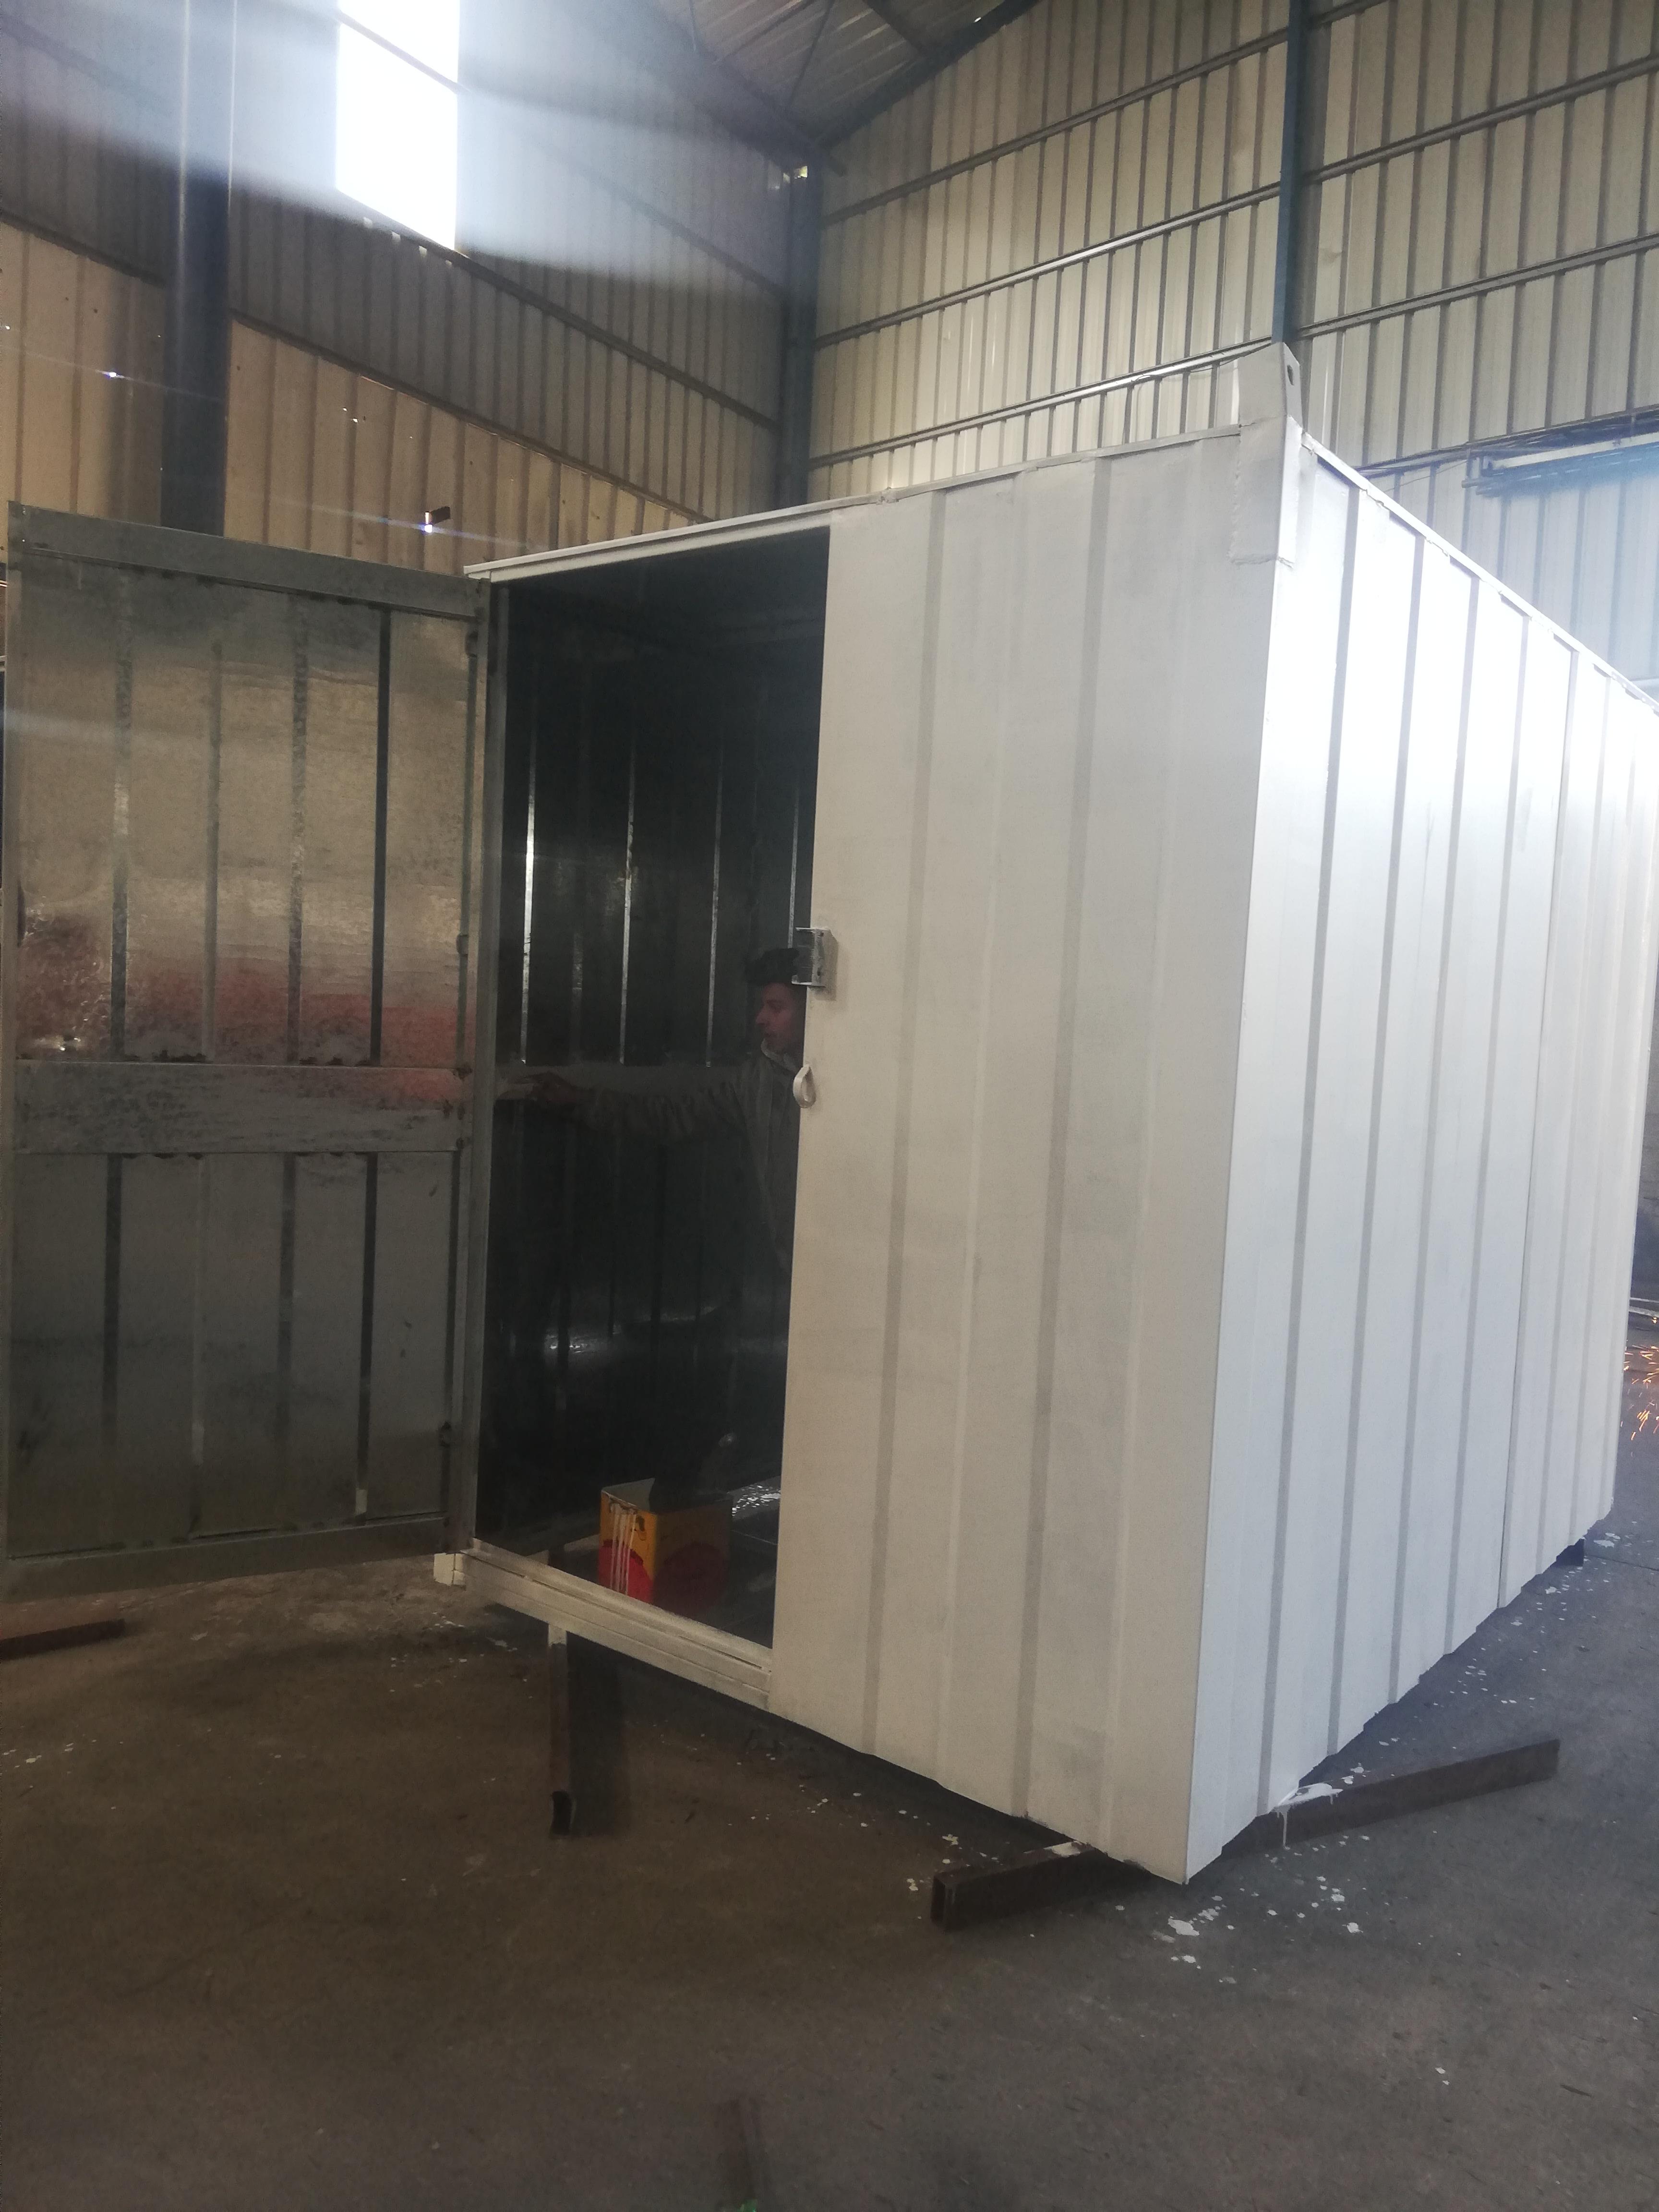 Filter Unit Housing 1